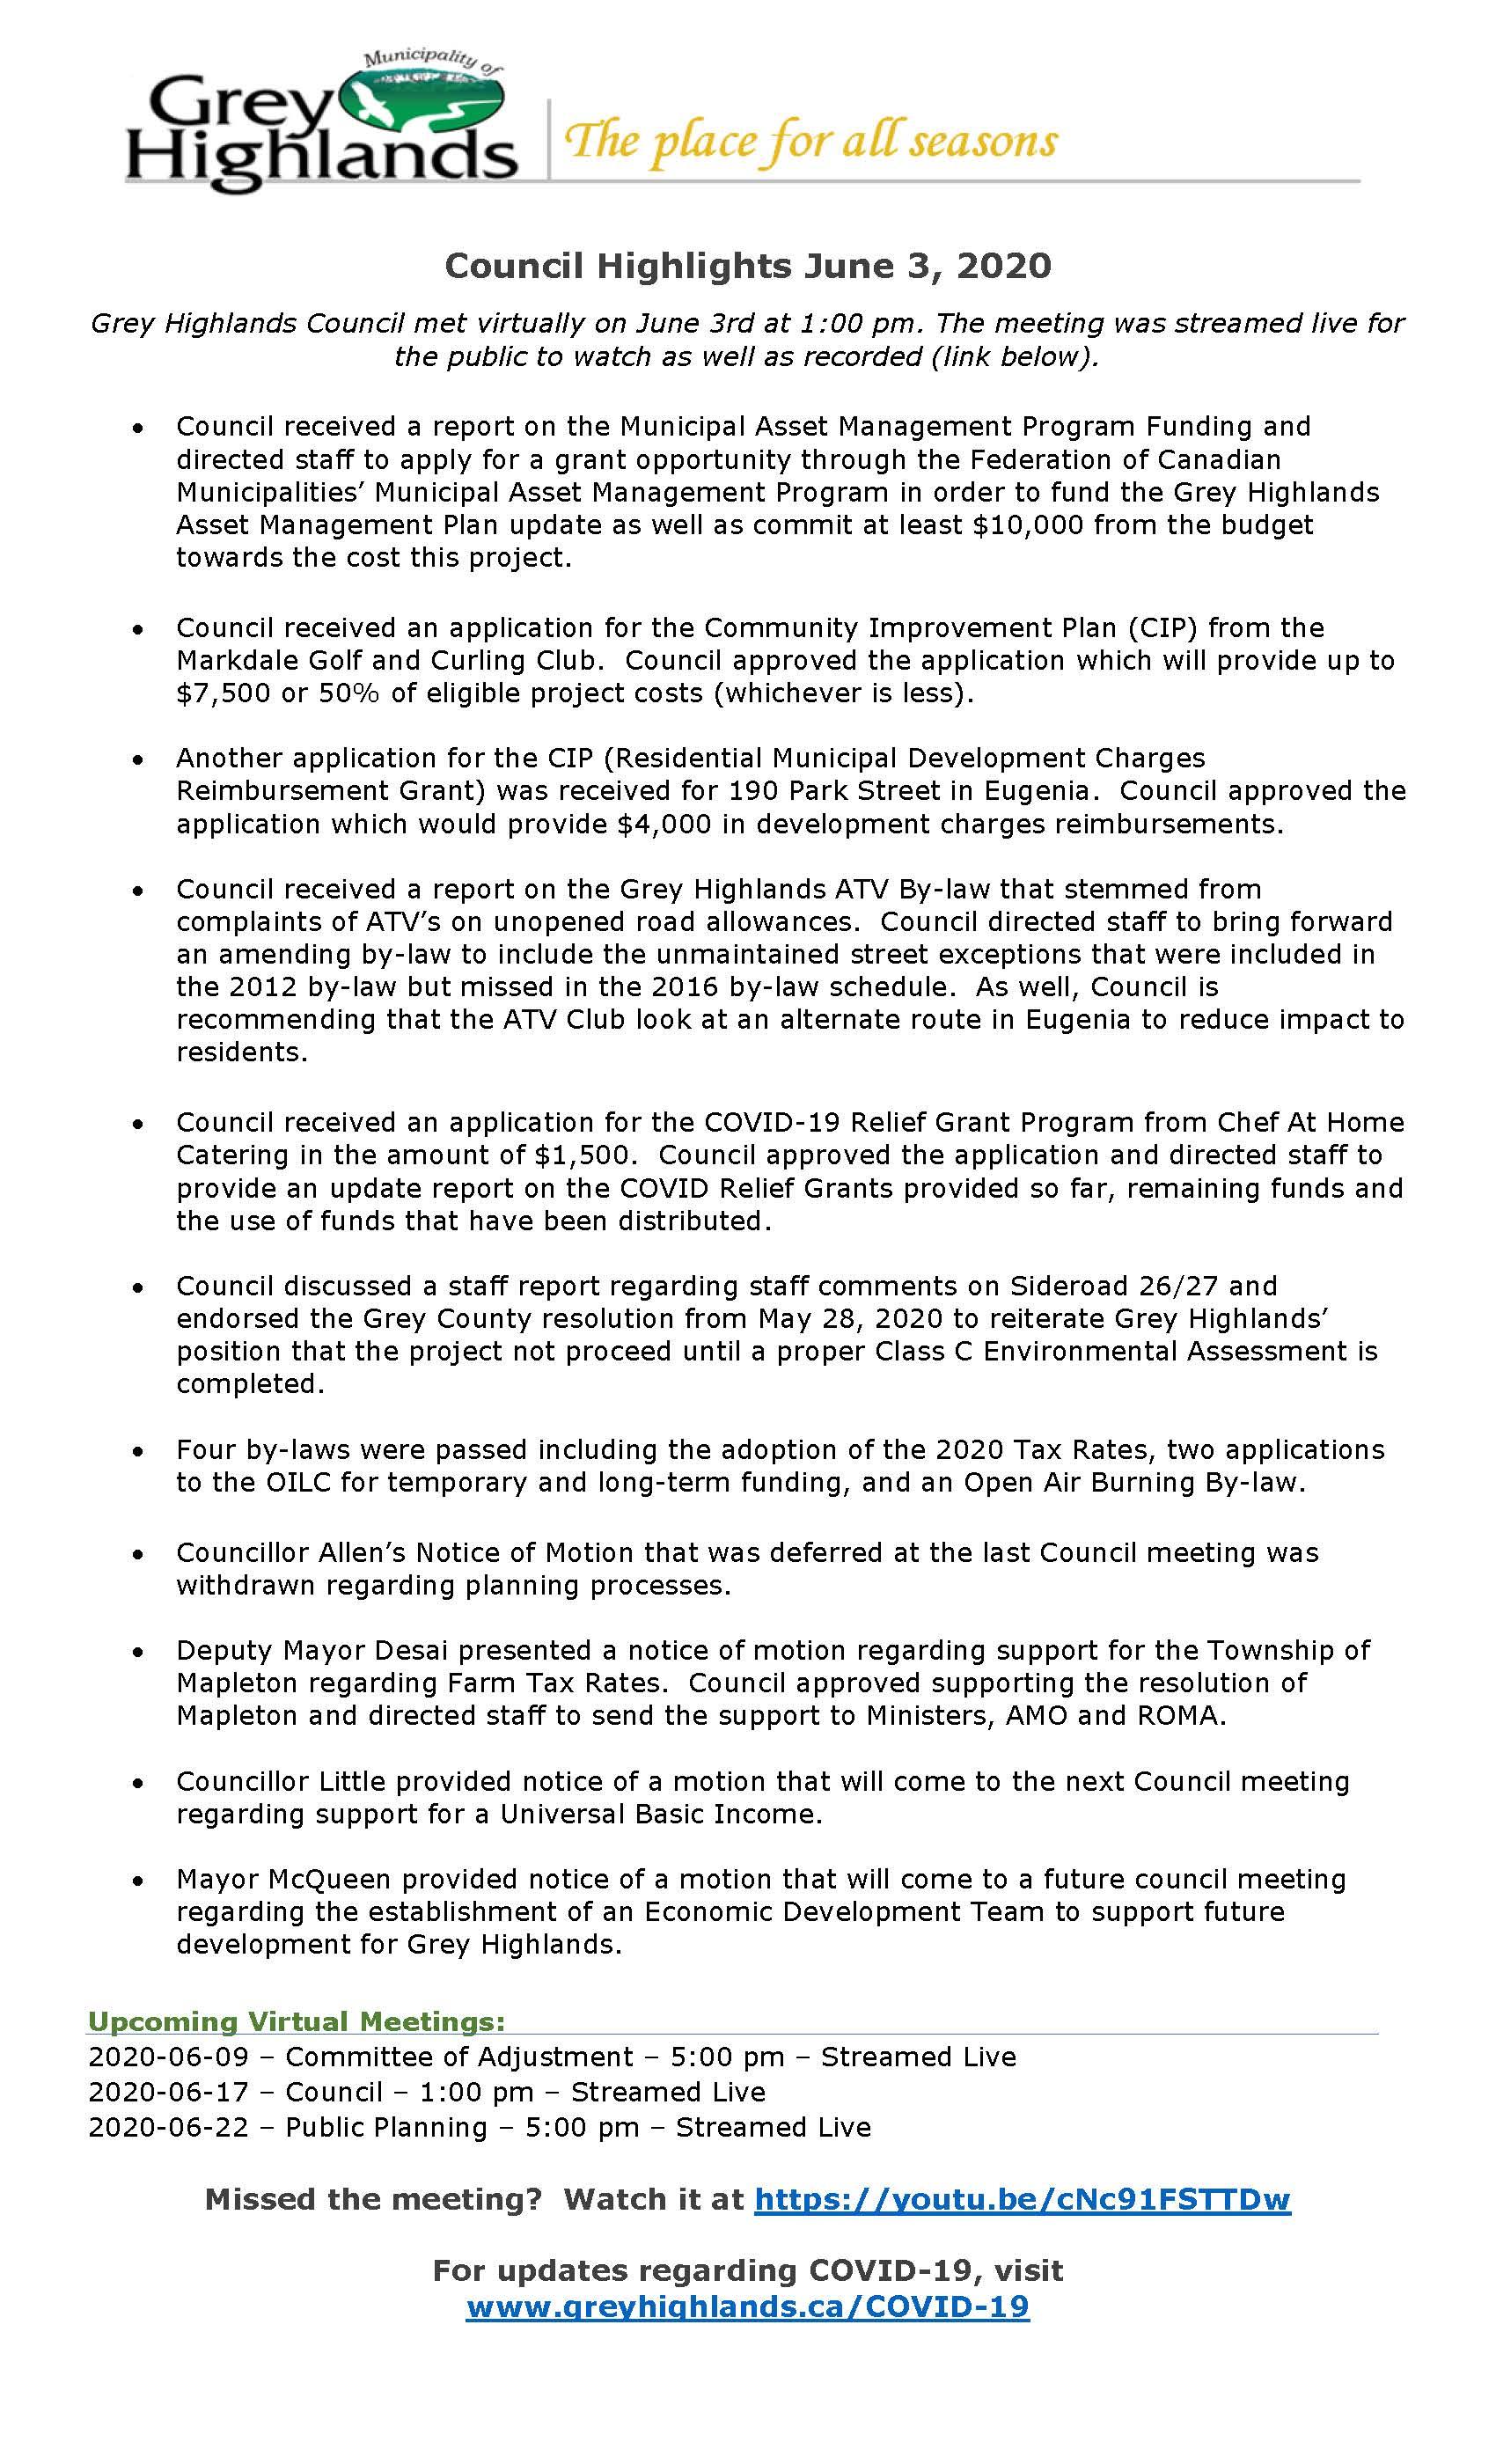 Council Highlights - June 3, 2020